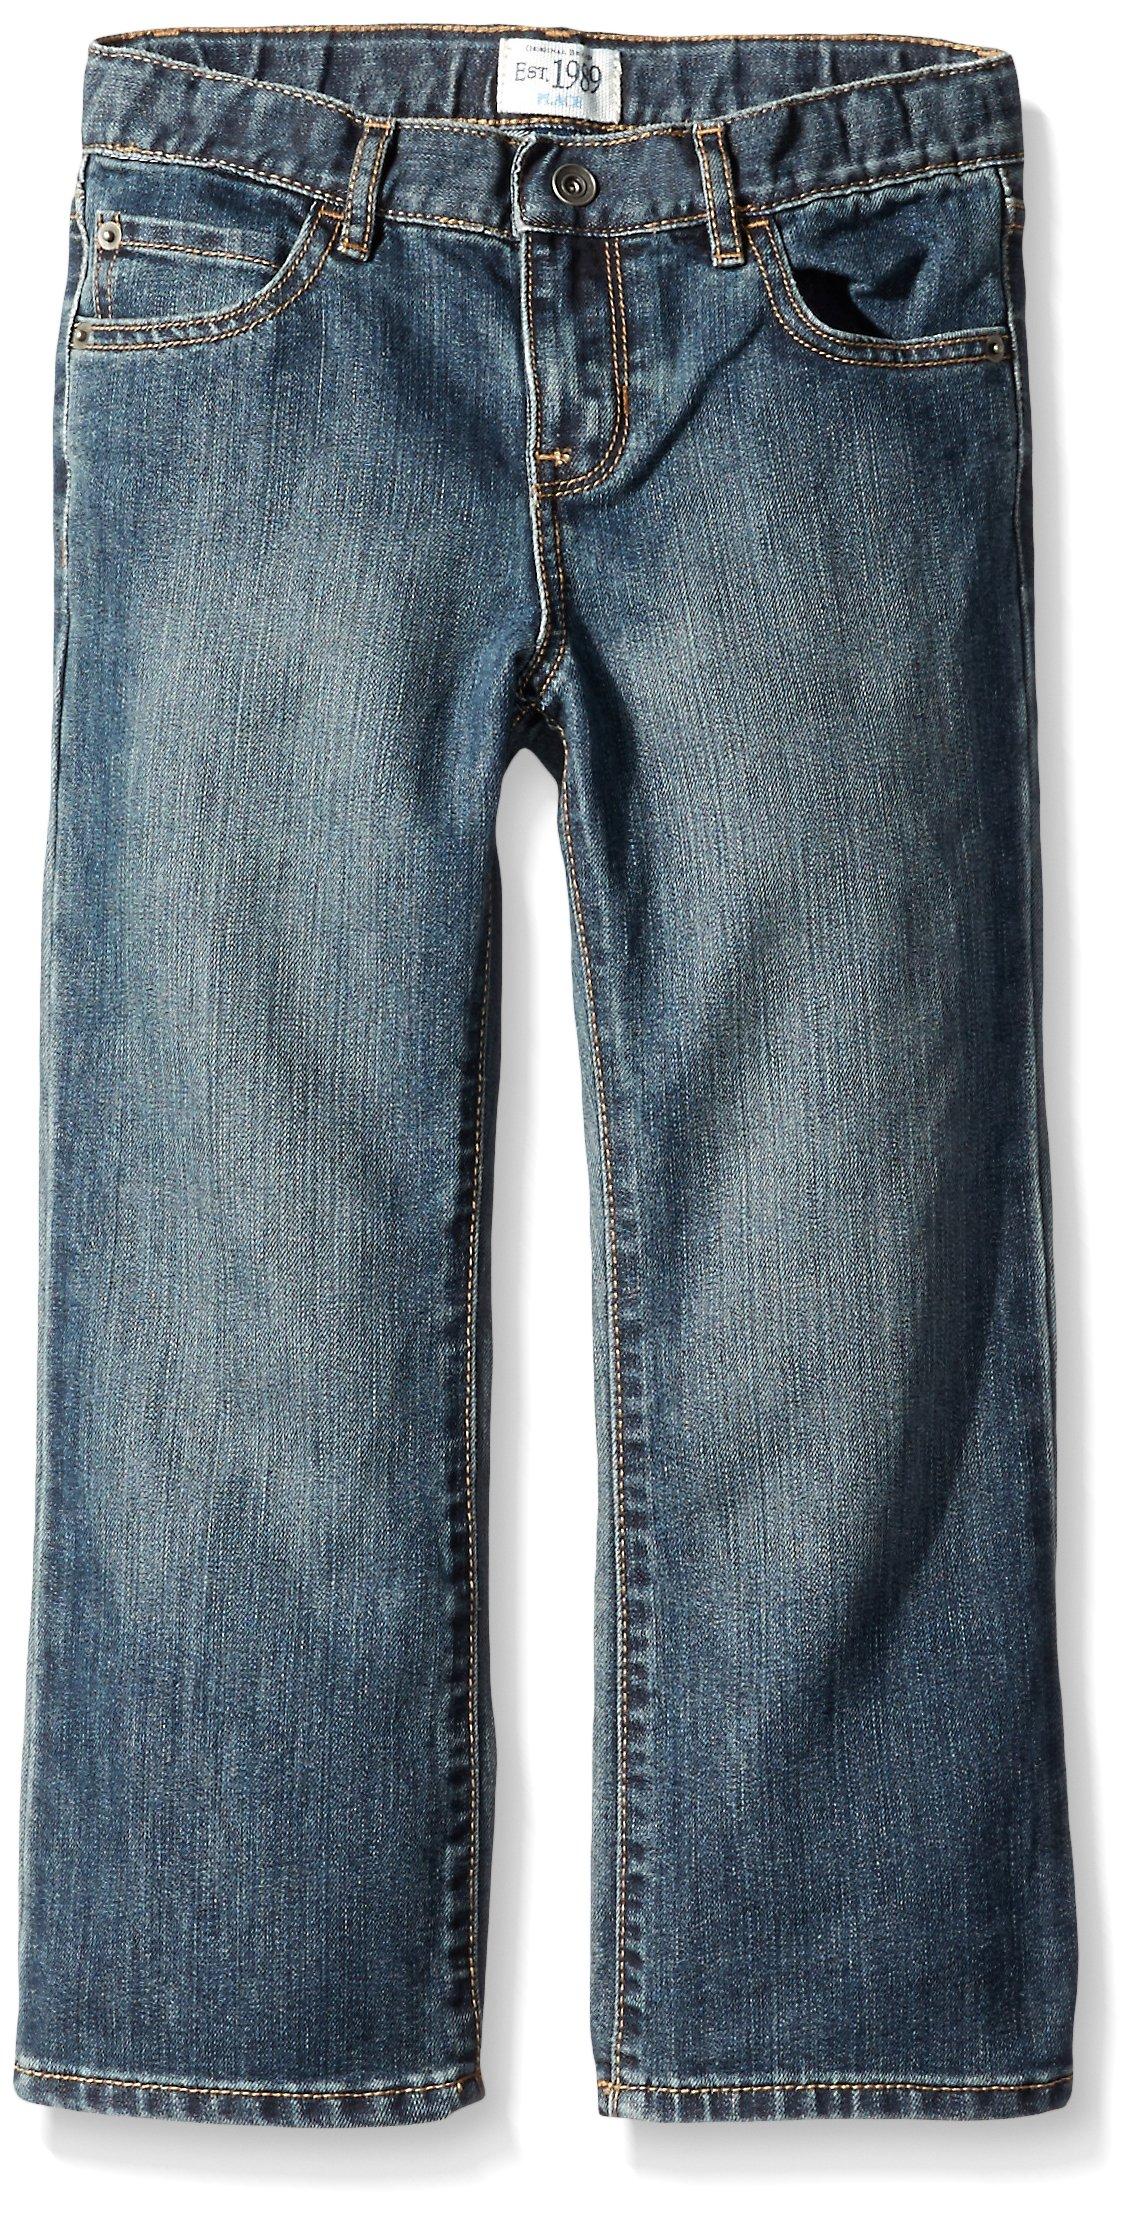 The Children's Place Husky Boys Bootcut Jeans, Dust Bowl, 6 Husky